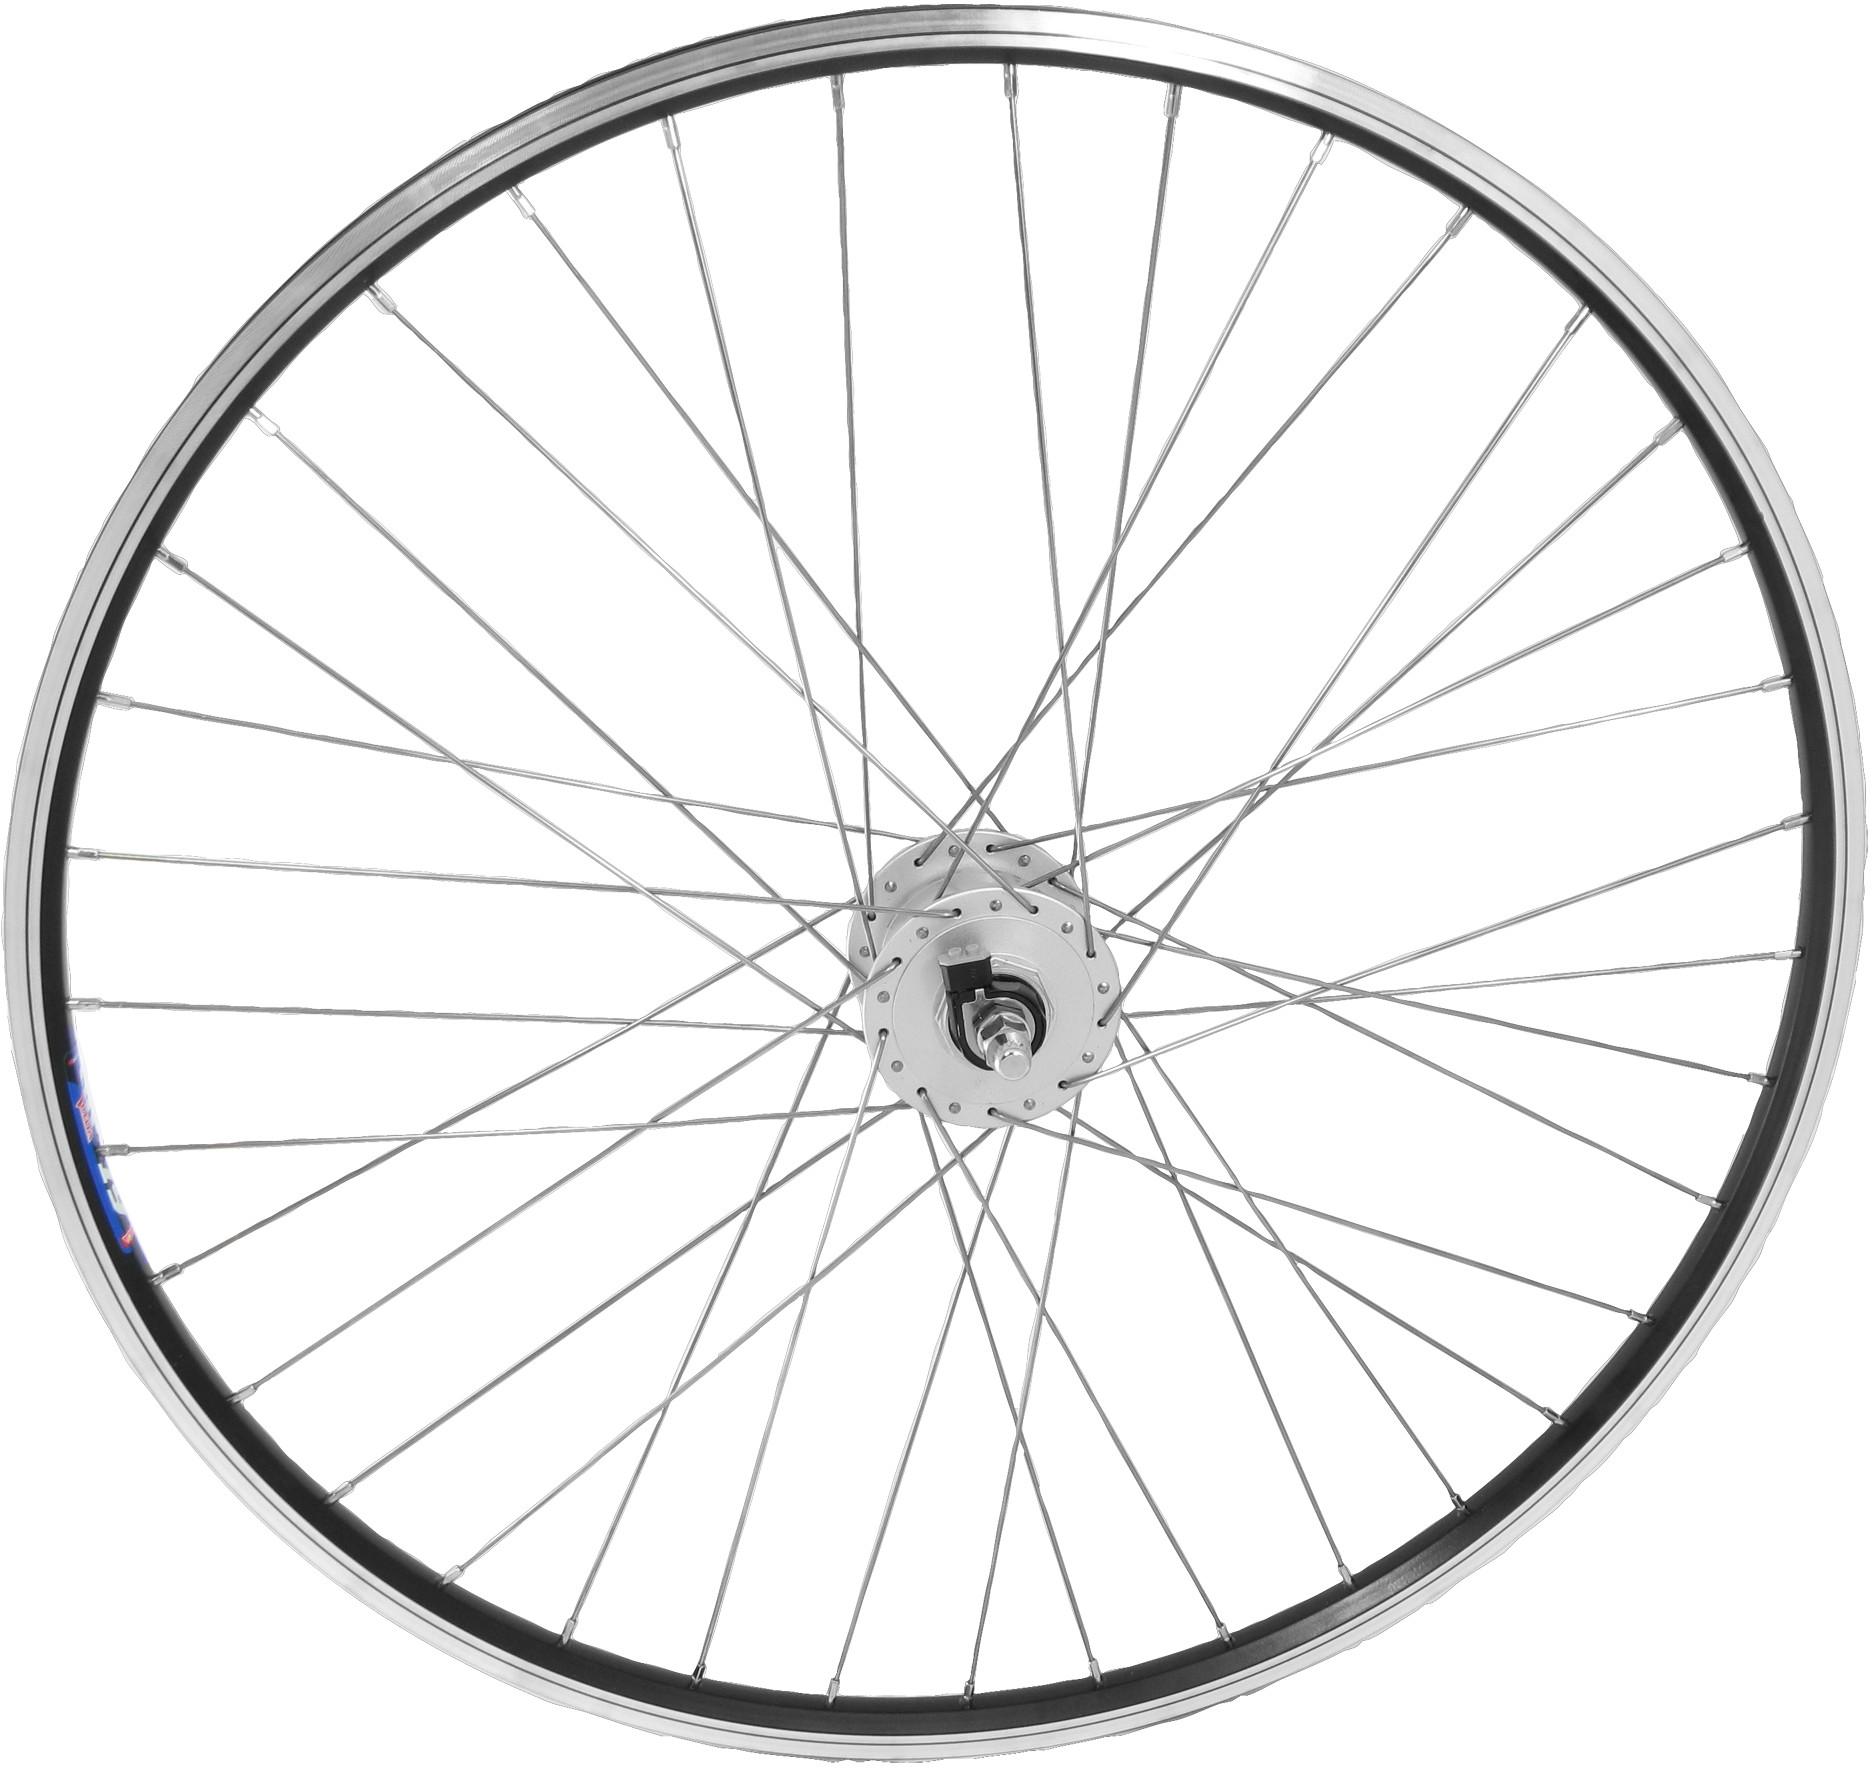 Trek 700c Airline 3 V Brake Qr Wheel Wheels Parts Shop Nevis Cycles